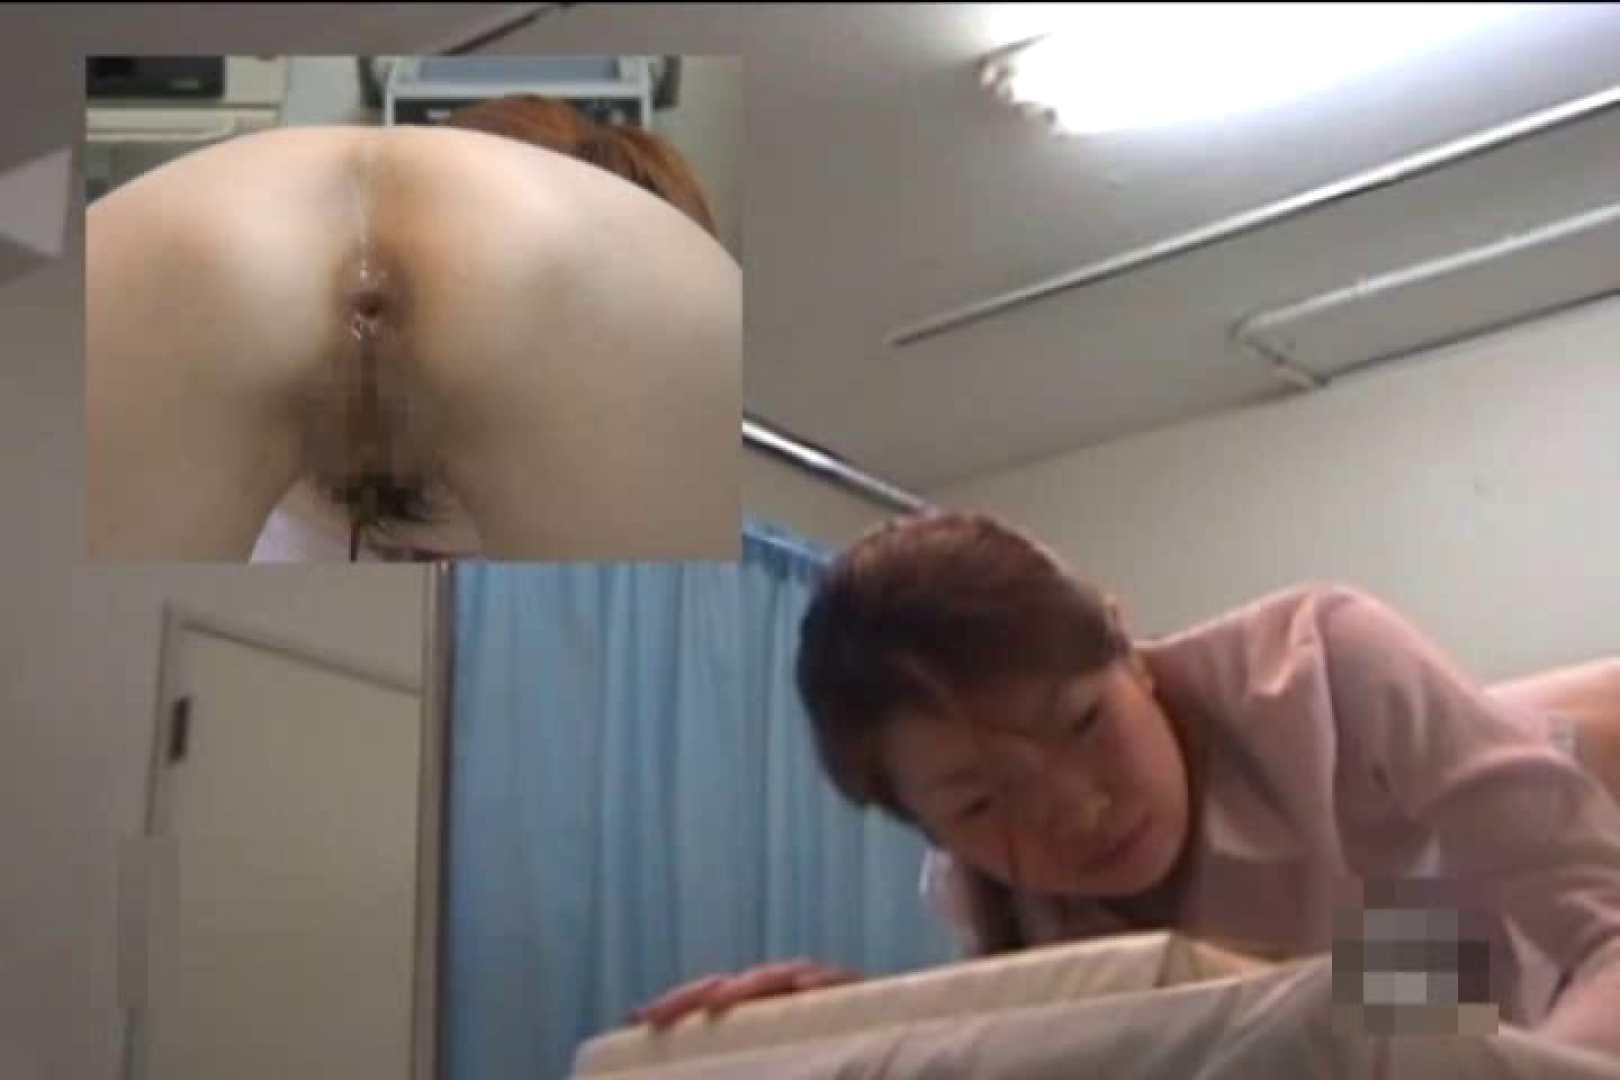 逆噴射病院 肛門科Vol.5 肛門 | OLセックス  88画像 63